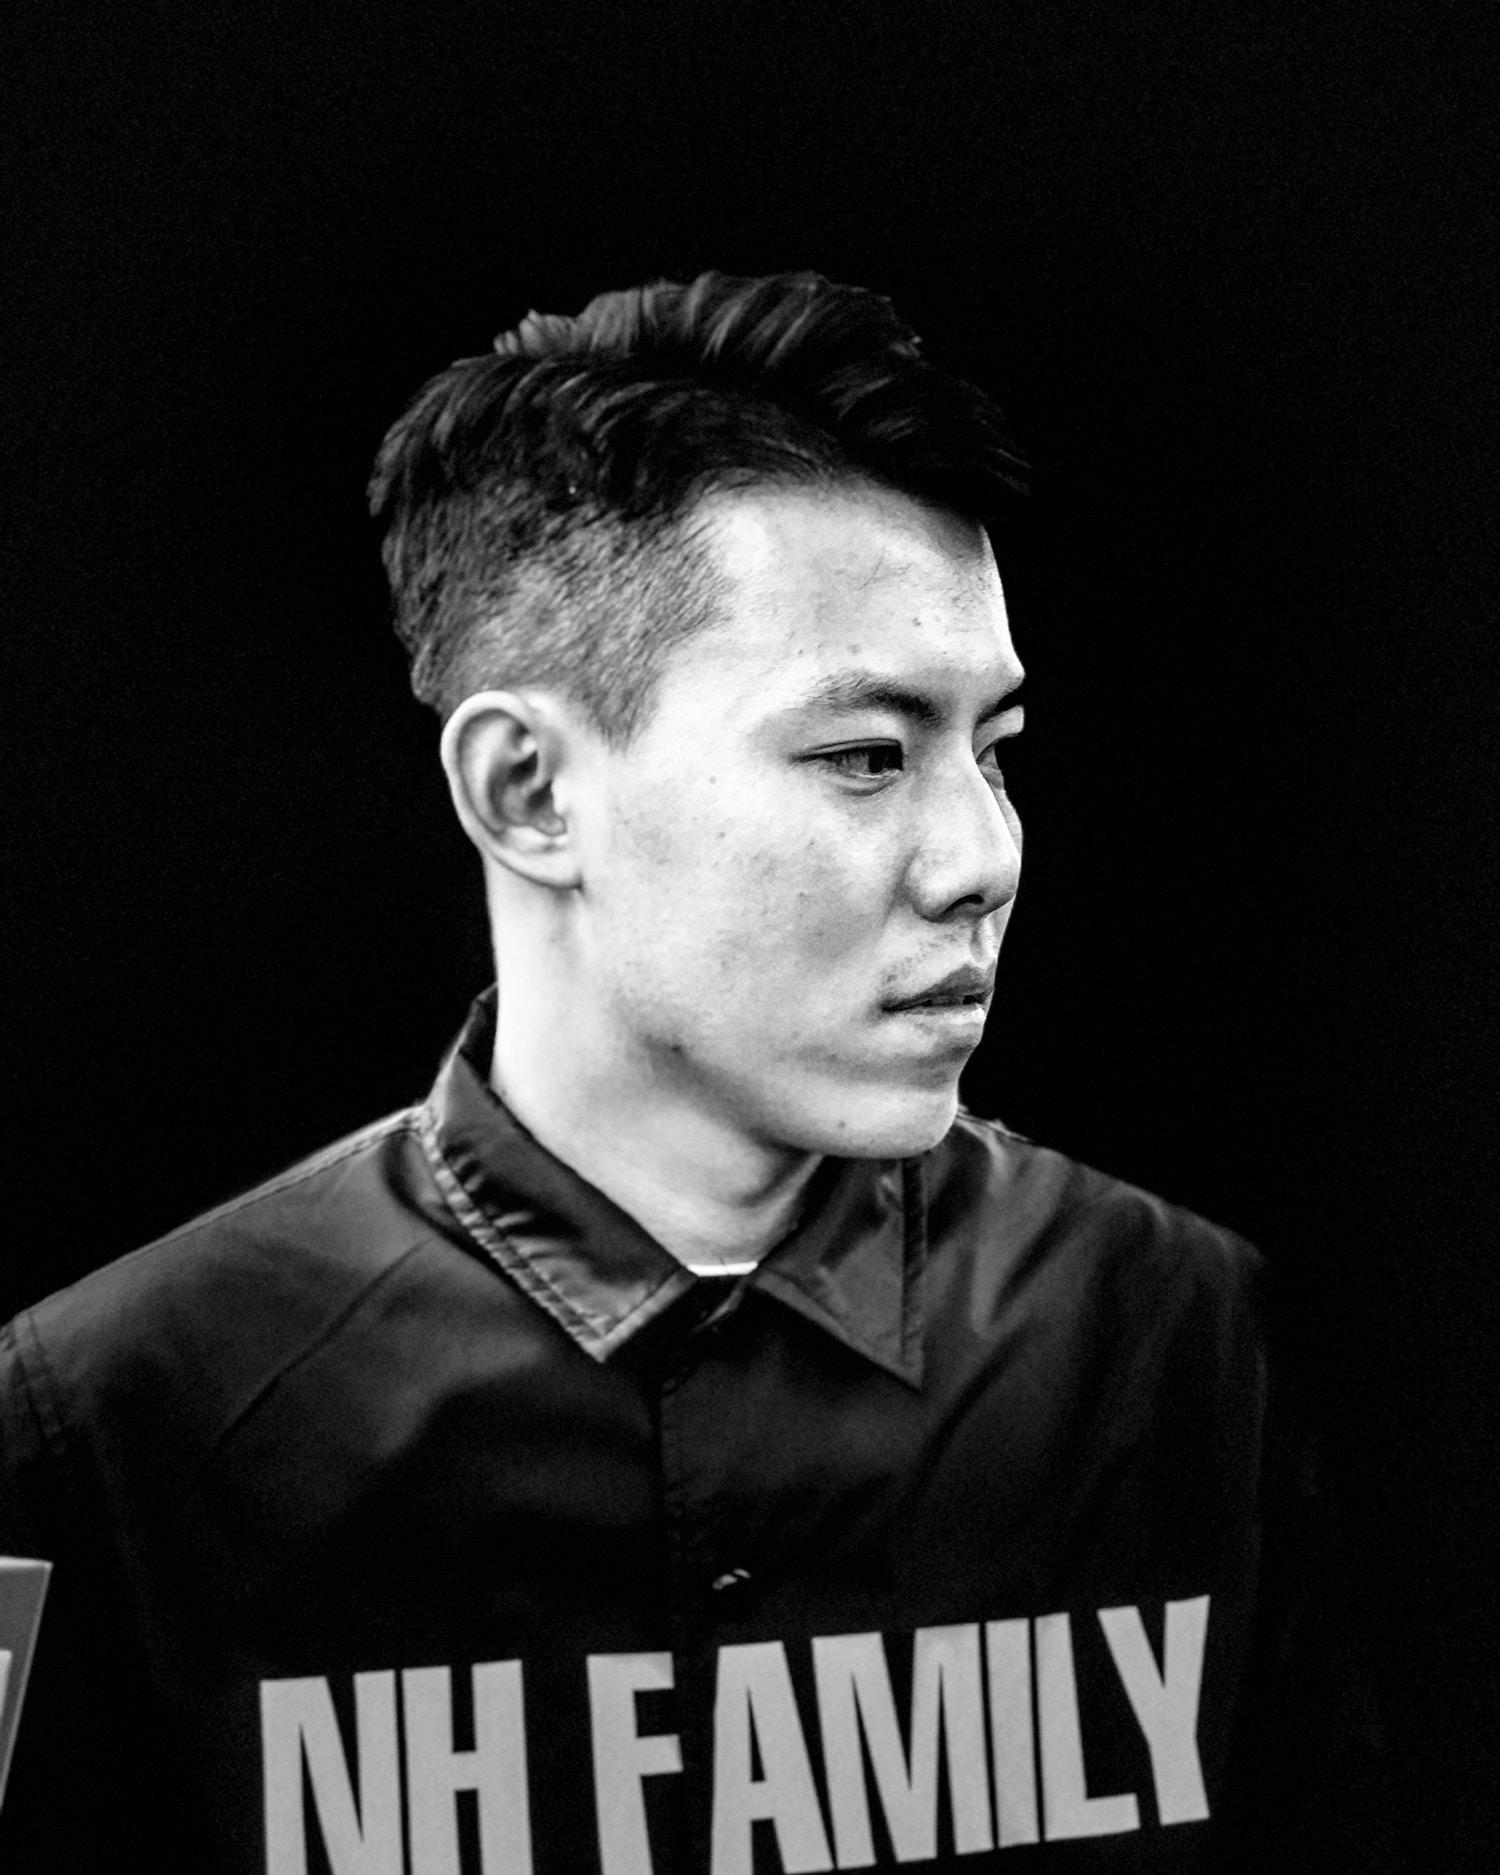 Go to TEDDY2 H's profile